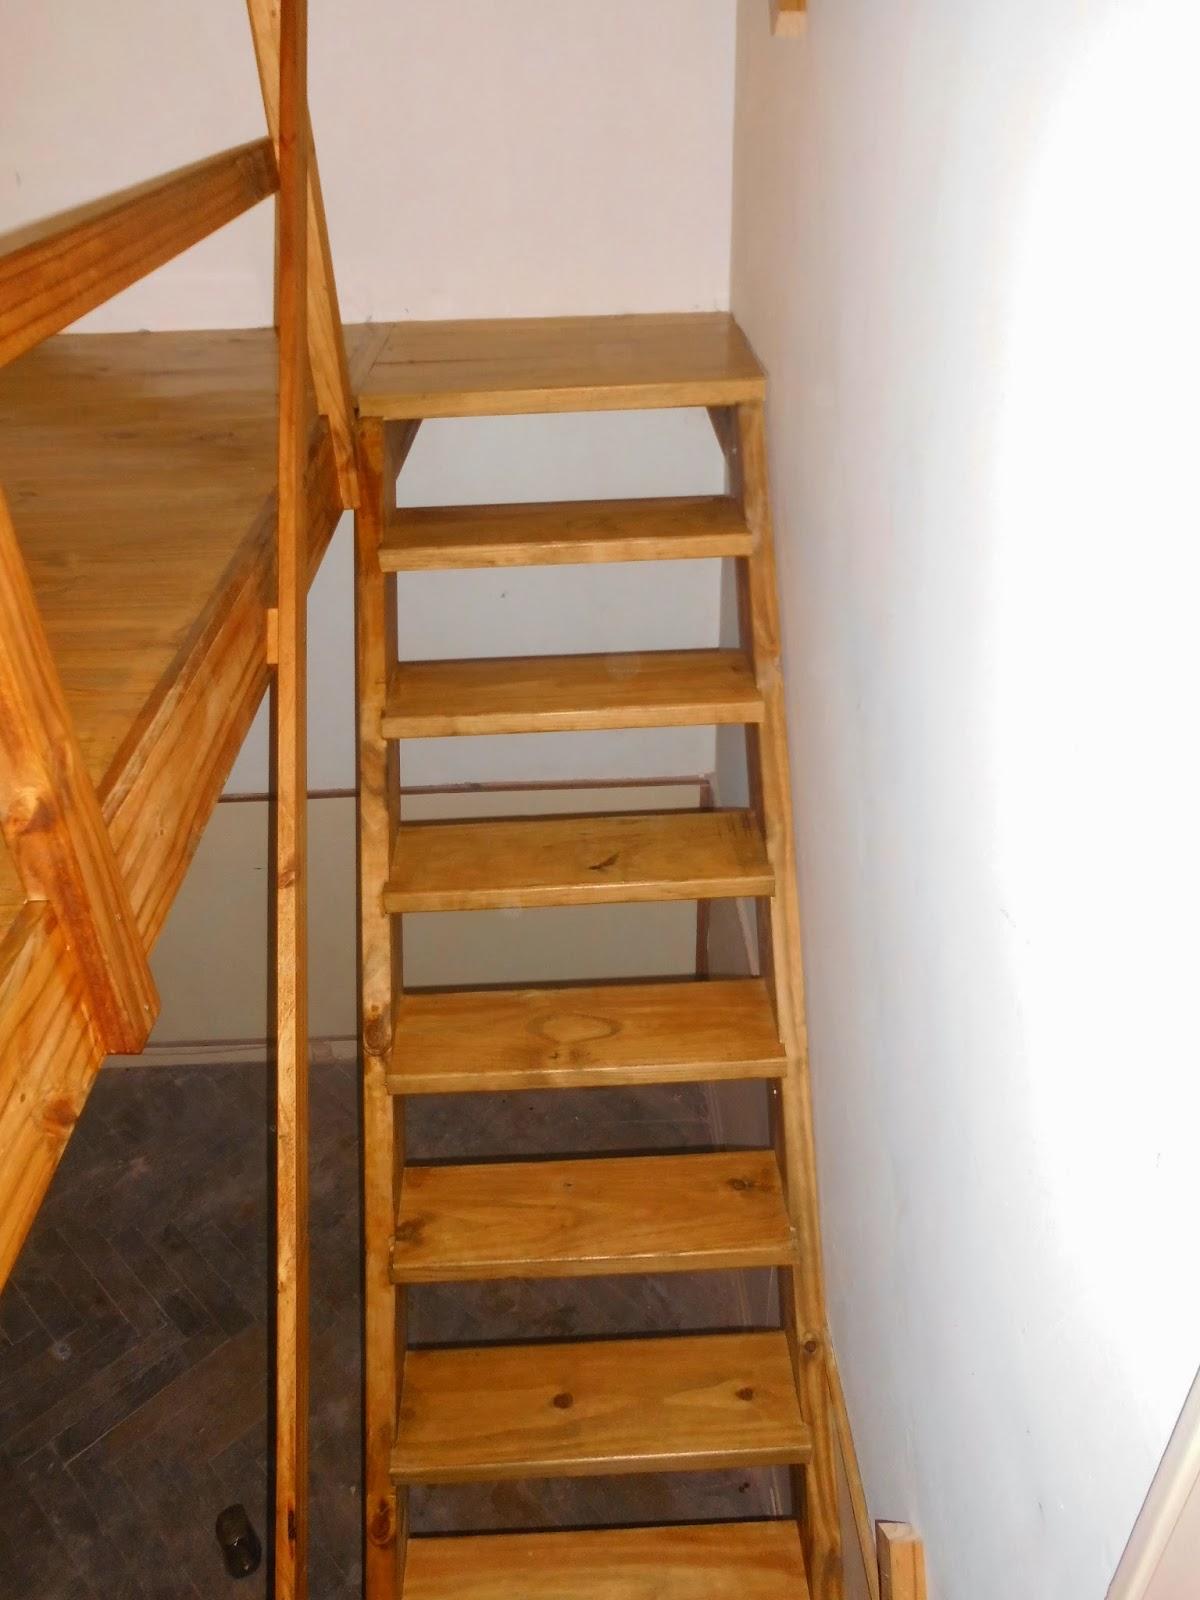 Entrepisos de madera escaleras escaleras for Escaleras 7 escalones